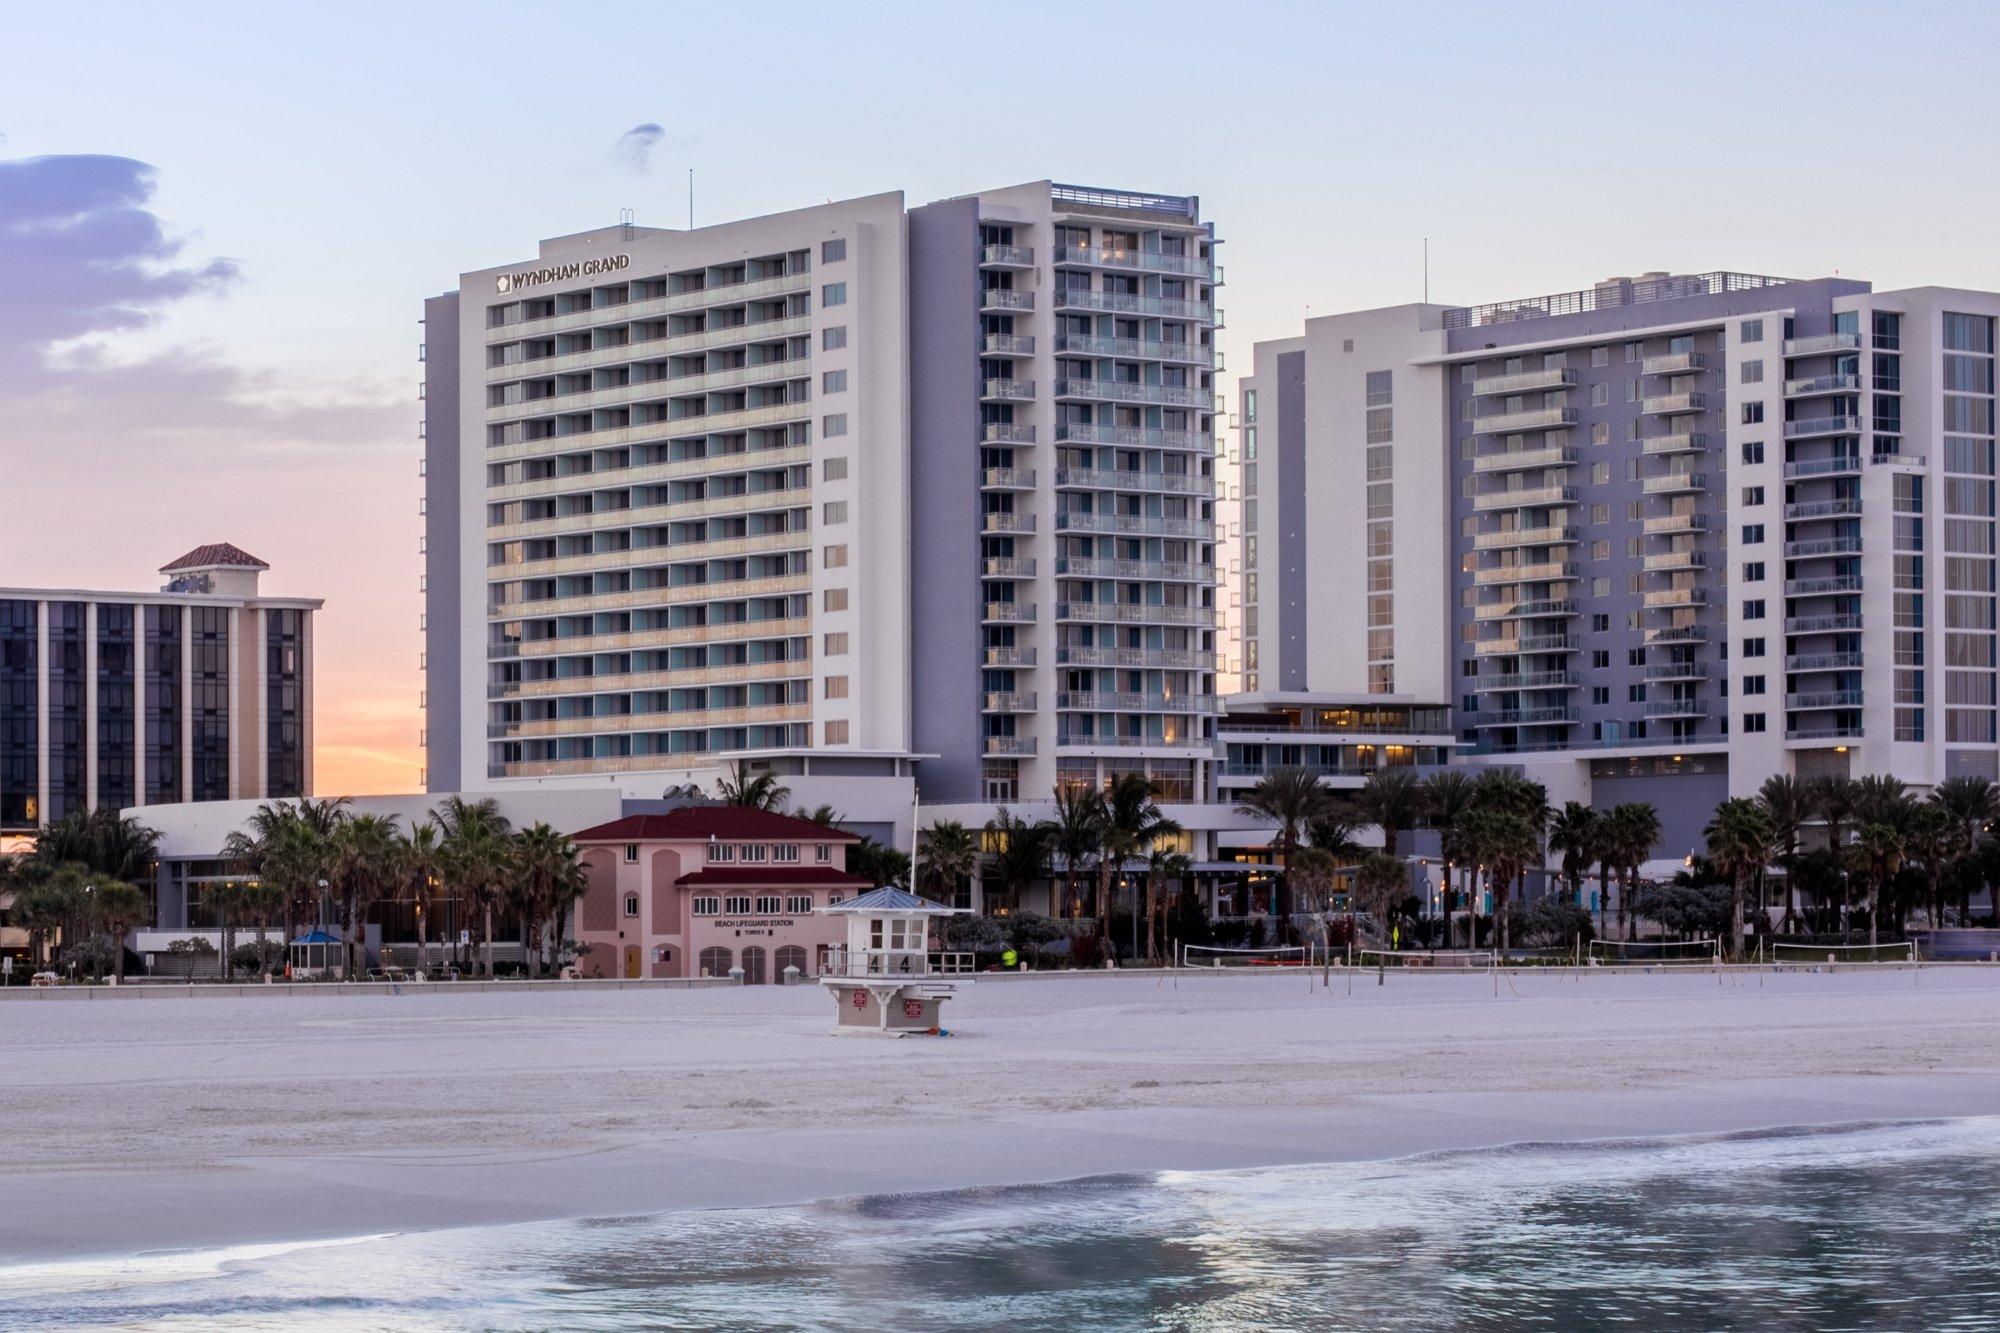 Wyndham Grand Clearwater Beach Resort Fl 2017 Review